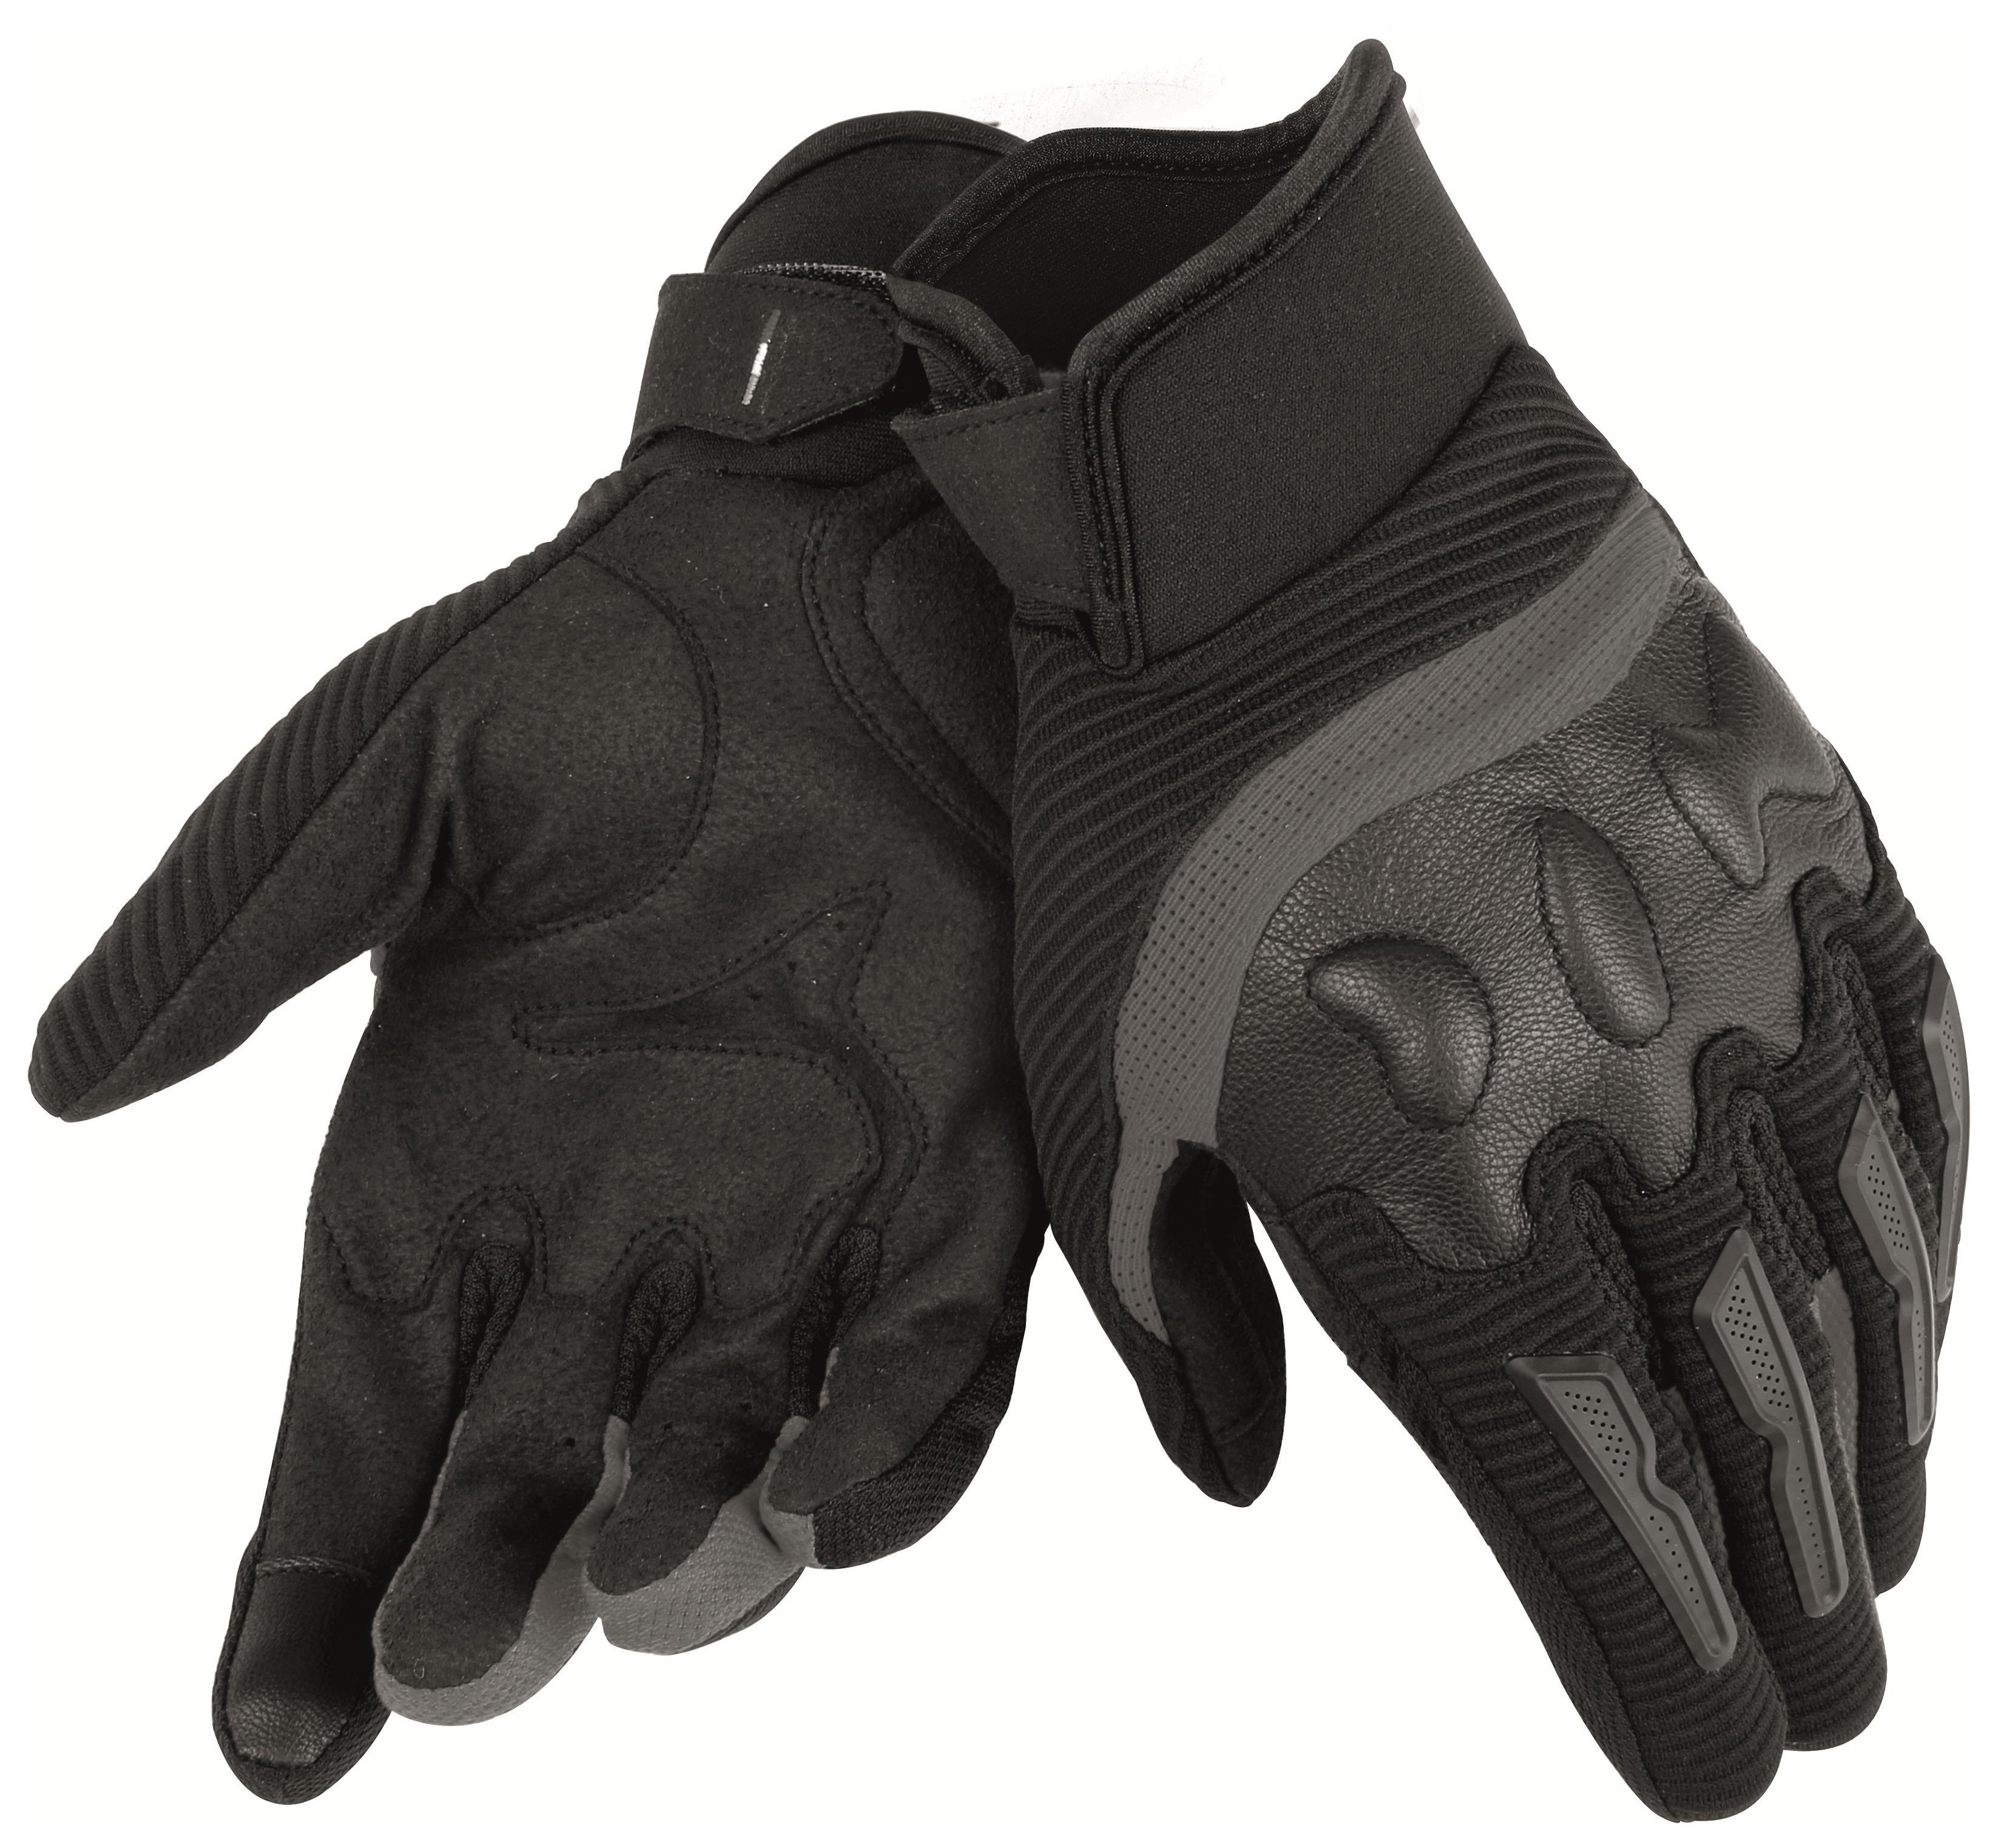 Dainese Air Frame Gloves Revzilla